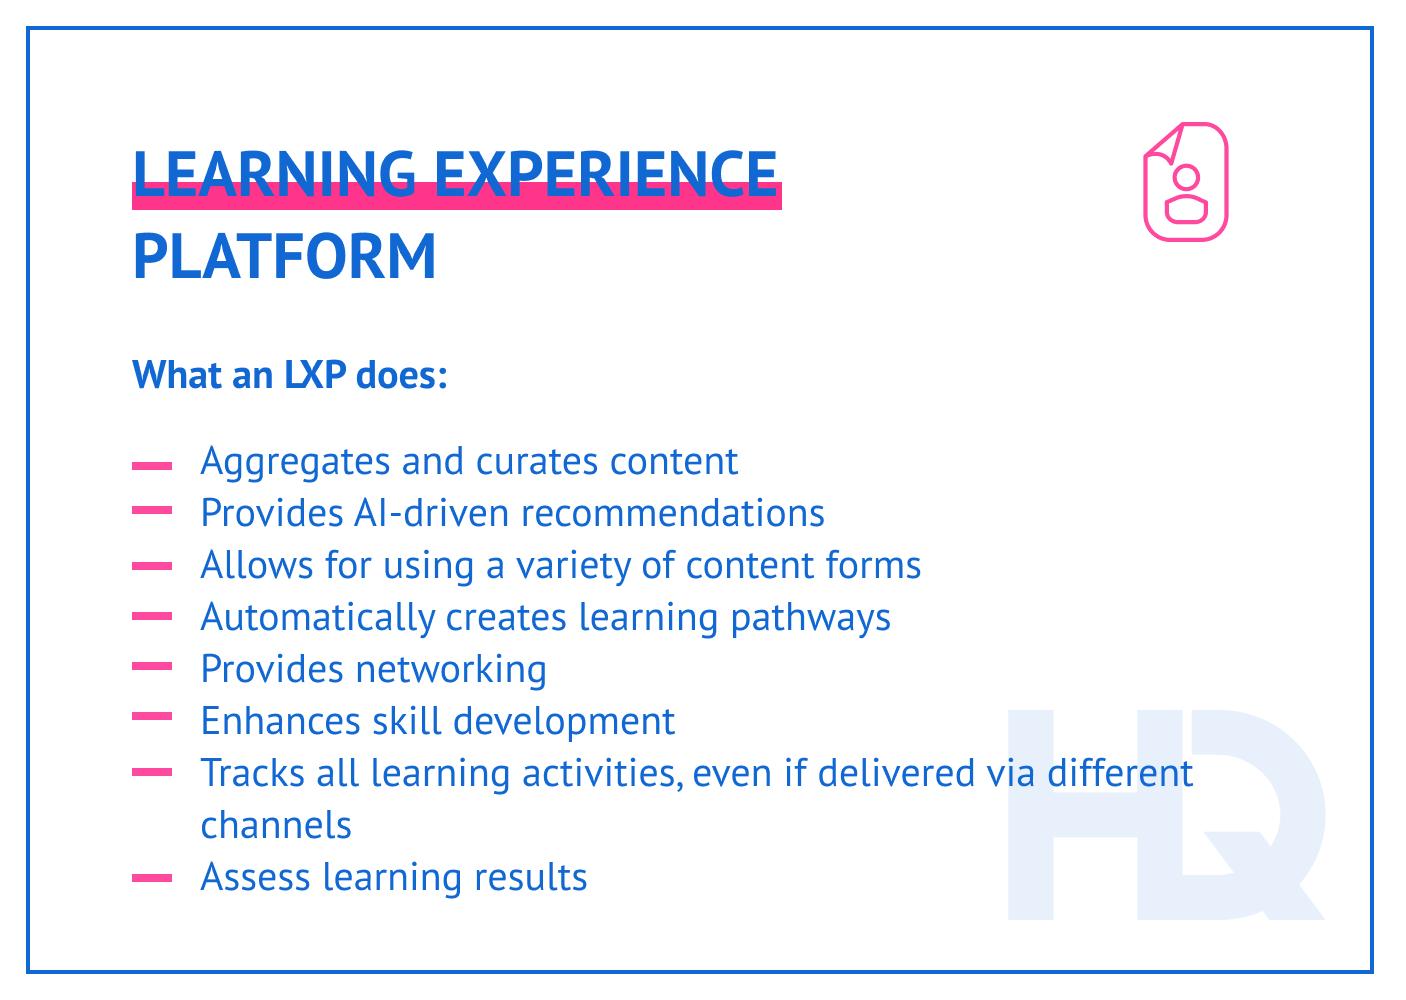 LXP benefits